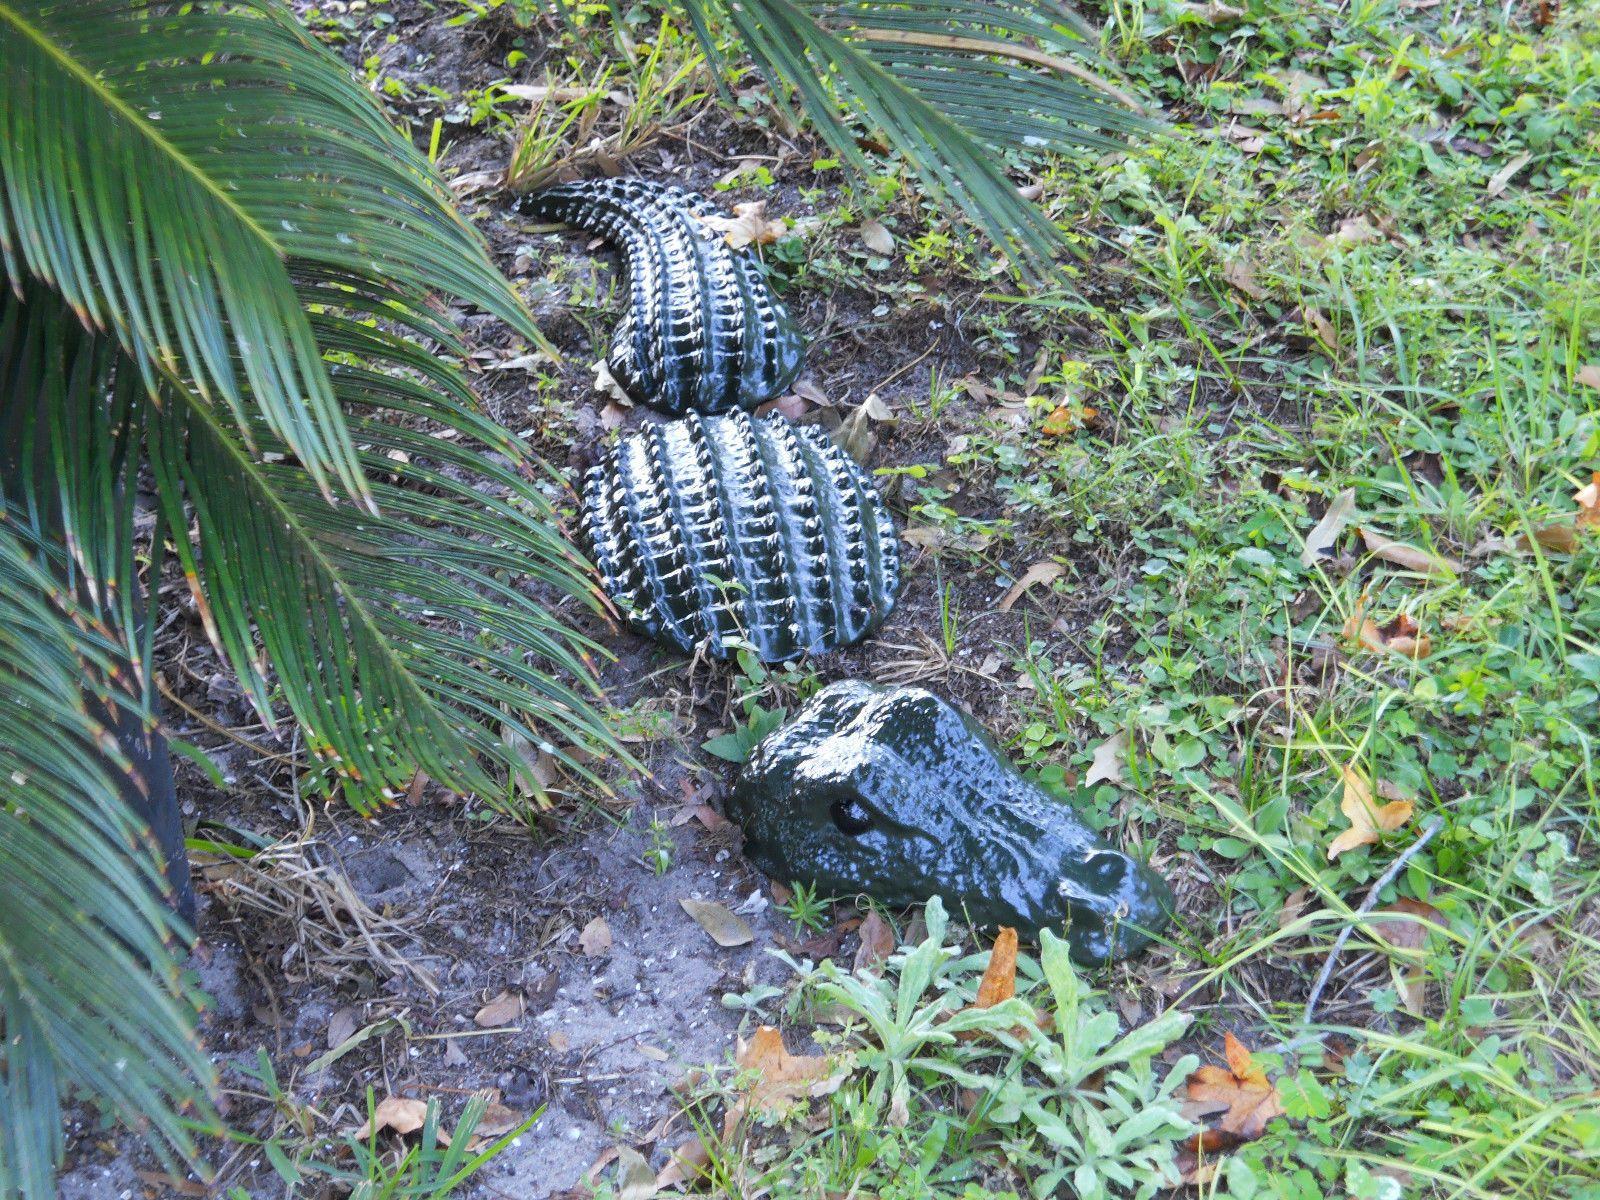 Genial Alligator Tire Lawn Art Pattern   3pc Large Alligator Statue / Yard Art /  Garden Stone / Lawn DecorFree .